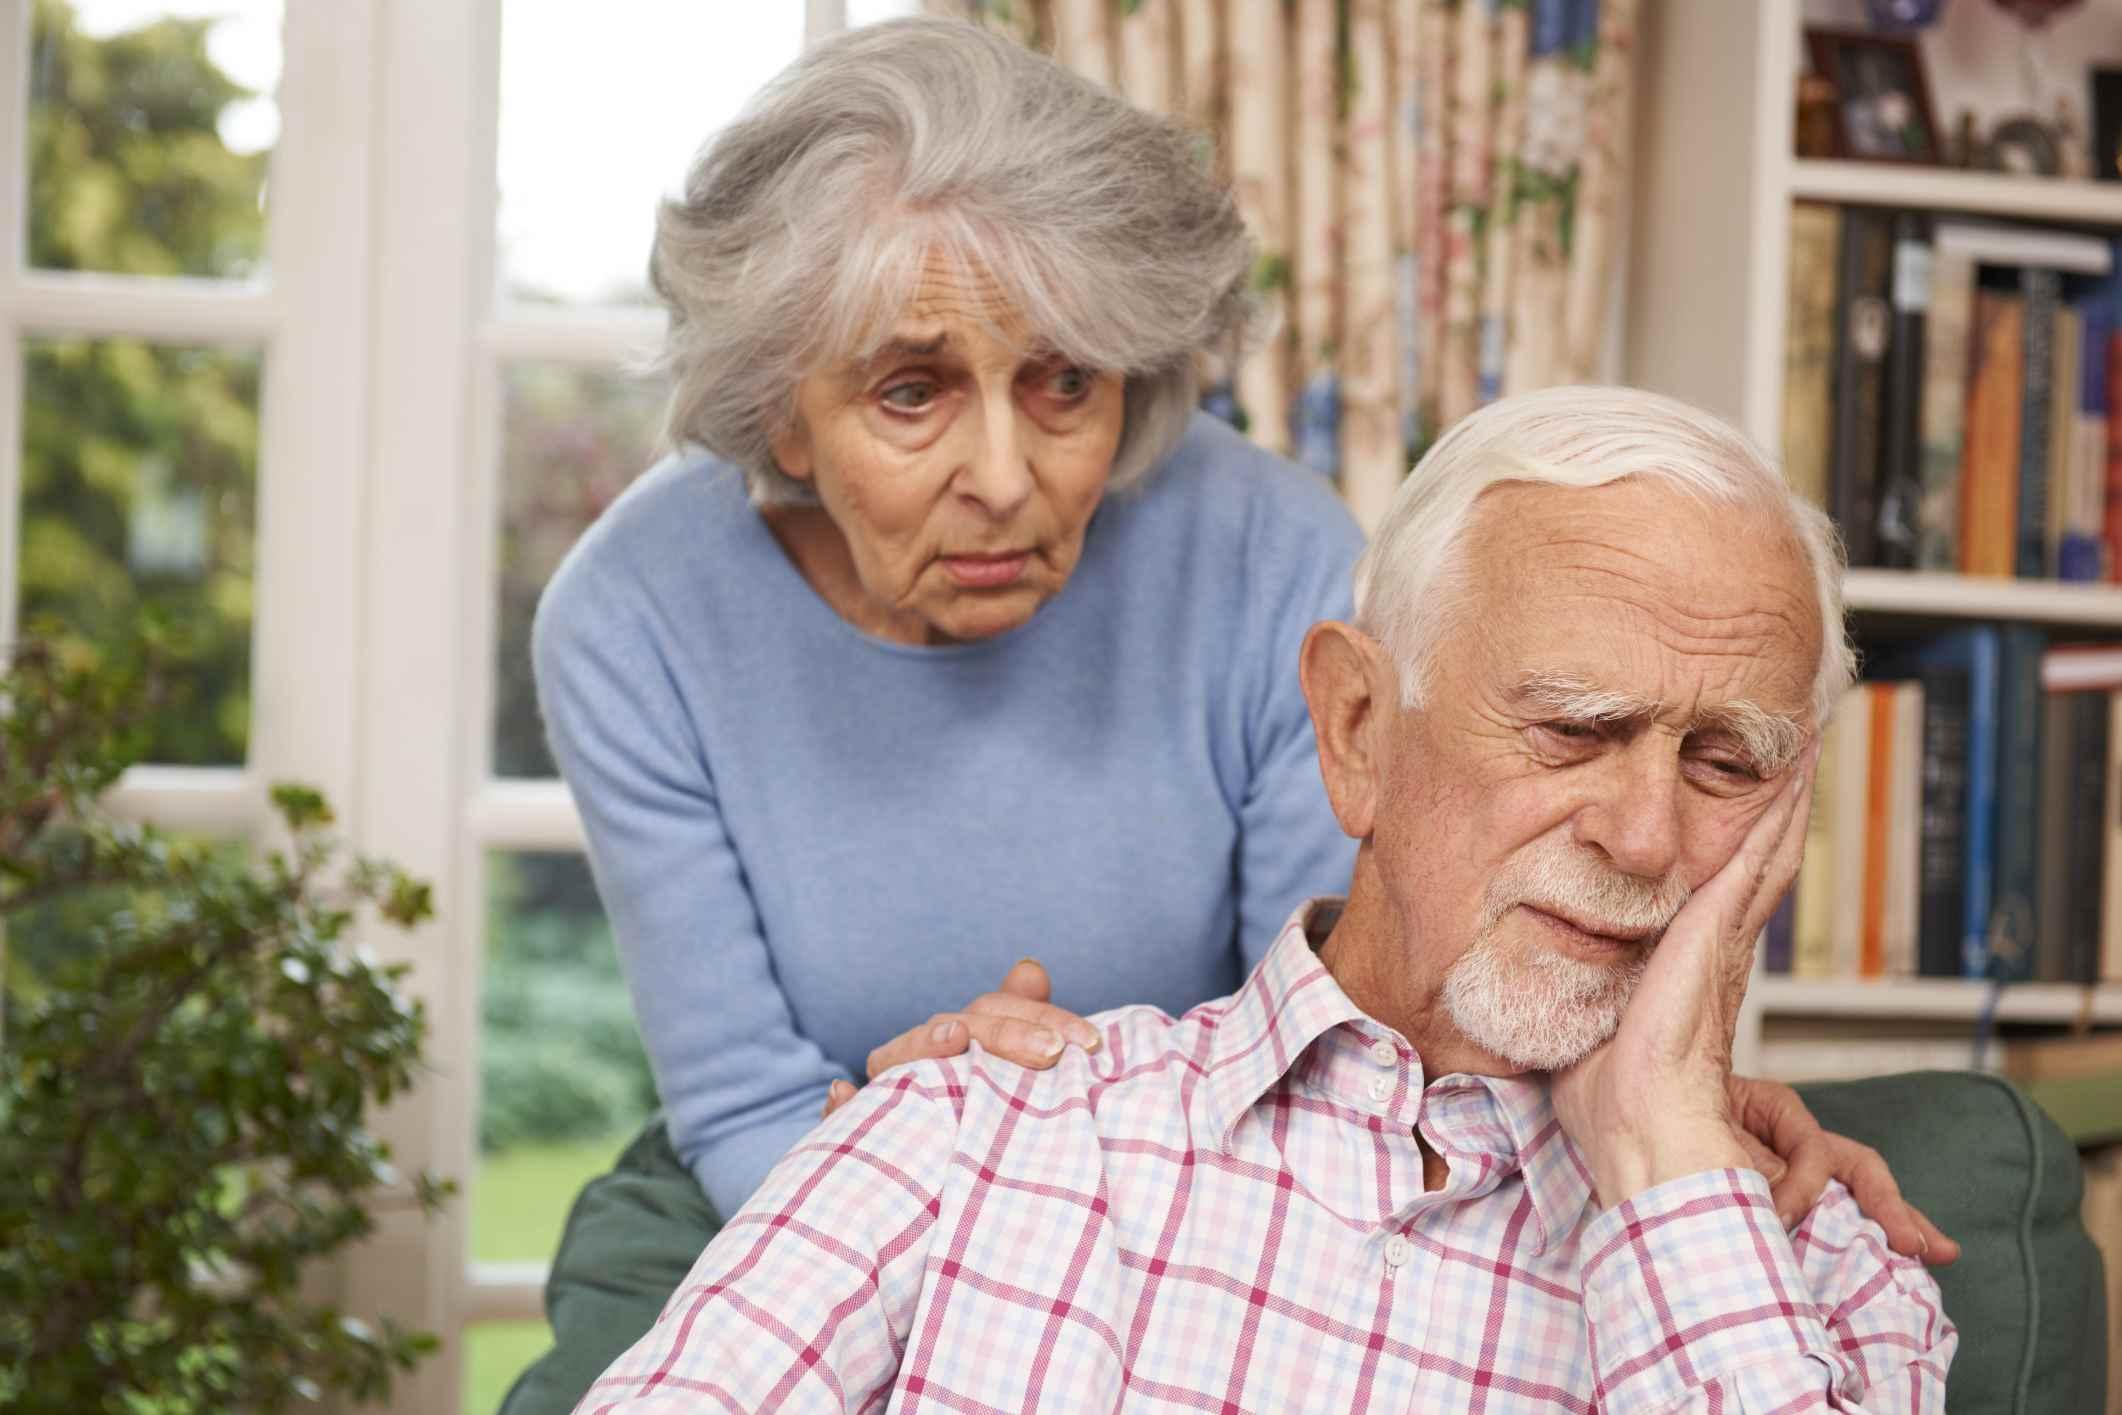 Sad senior man with concerned senior woman